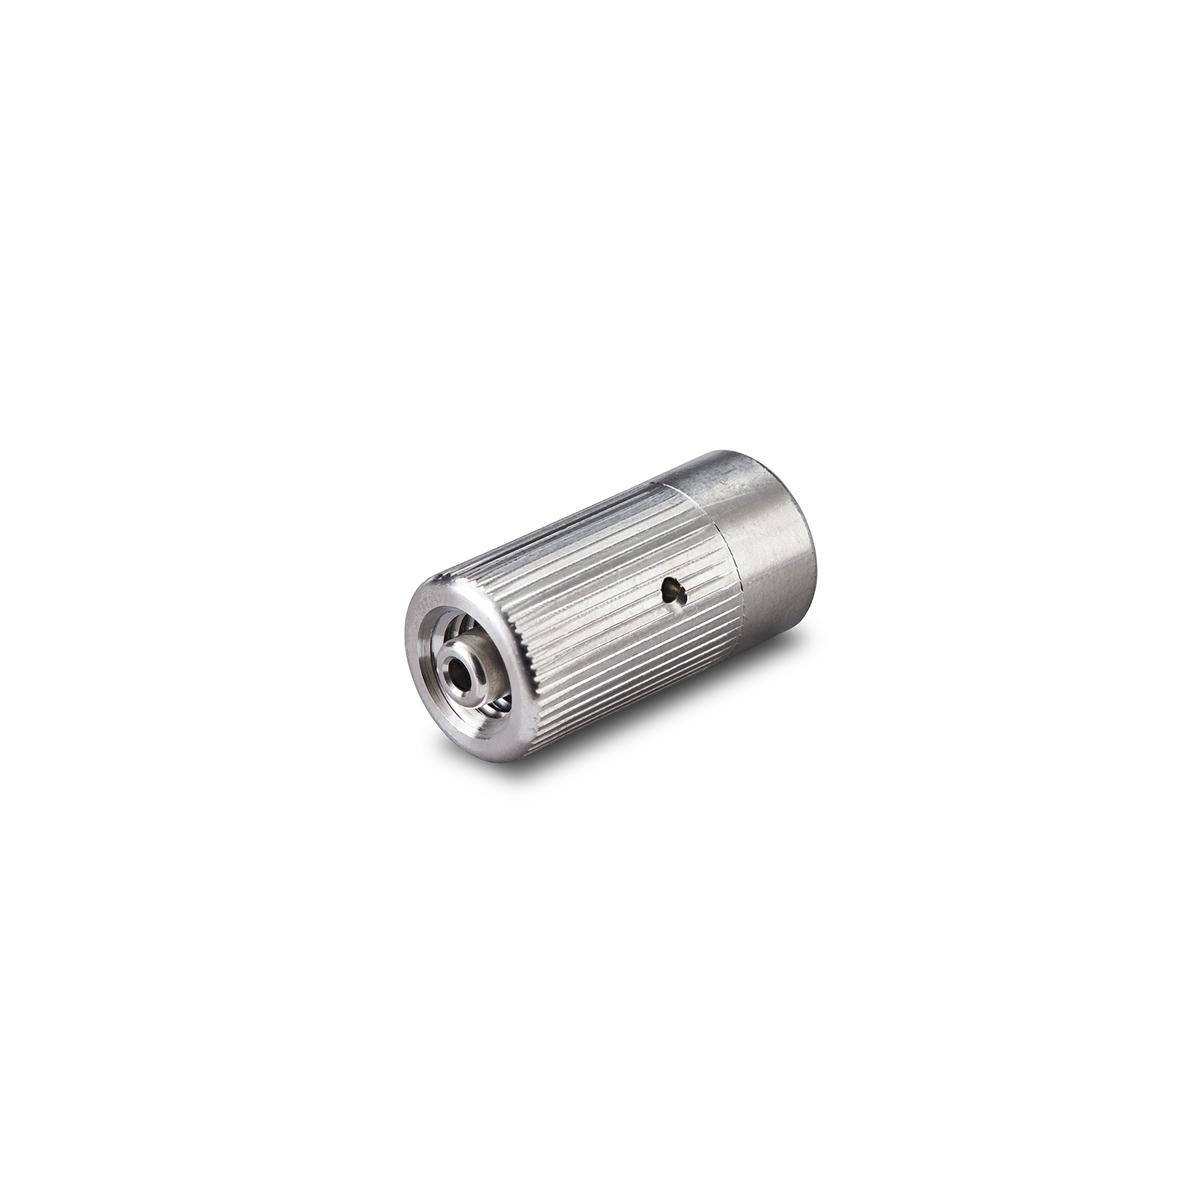 Tubing Adapter Image